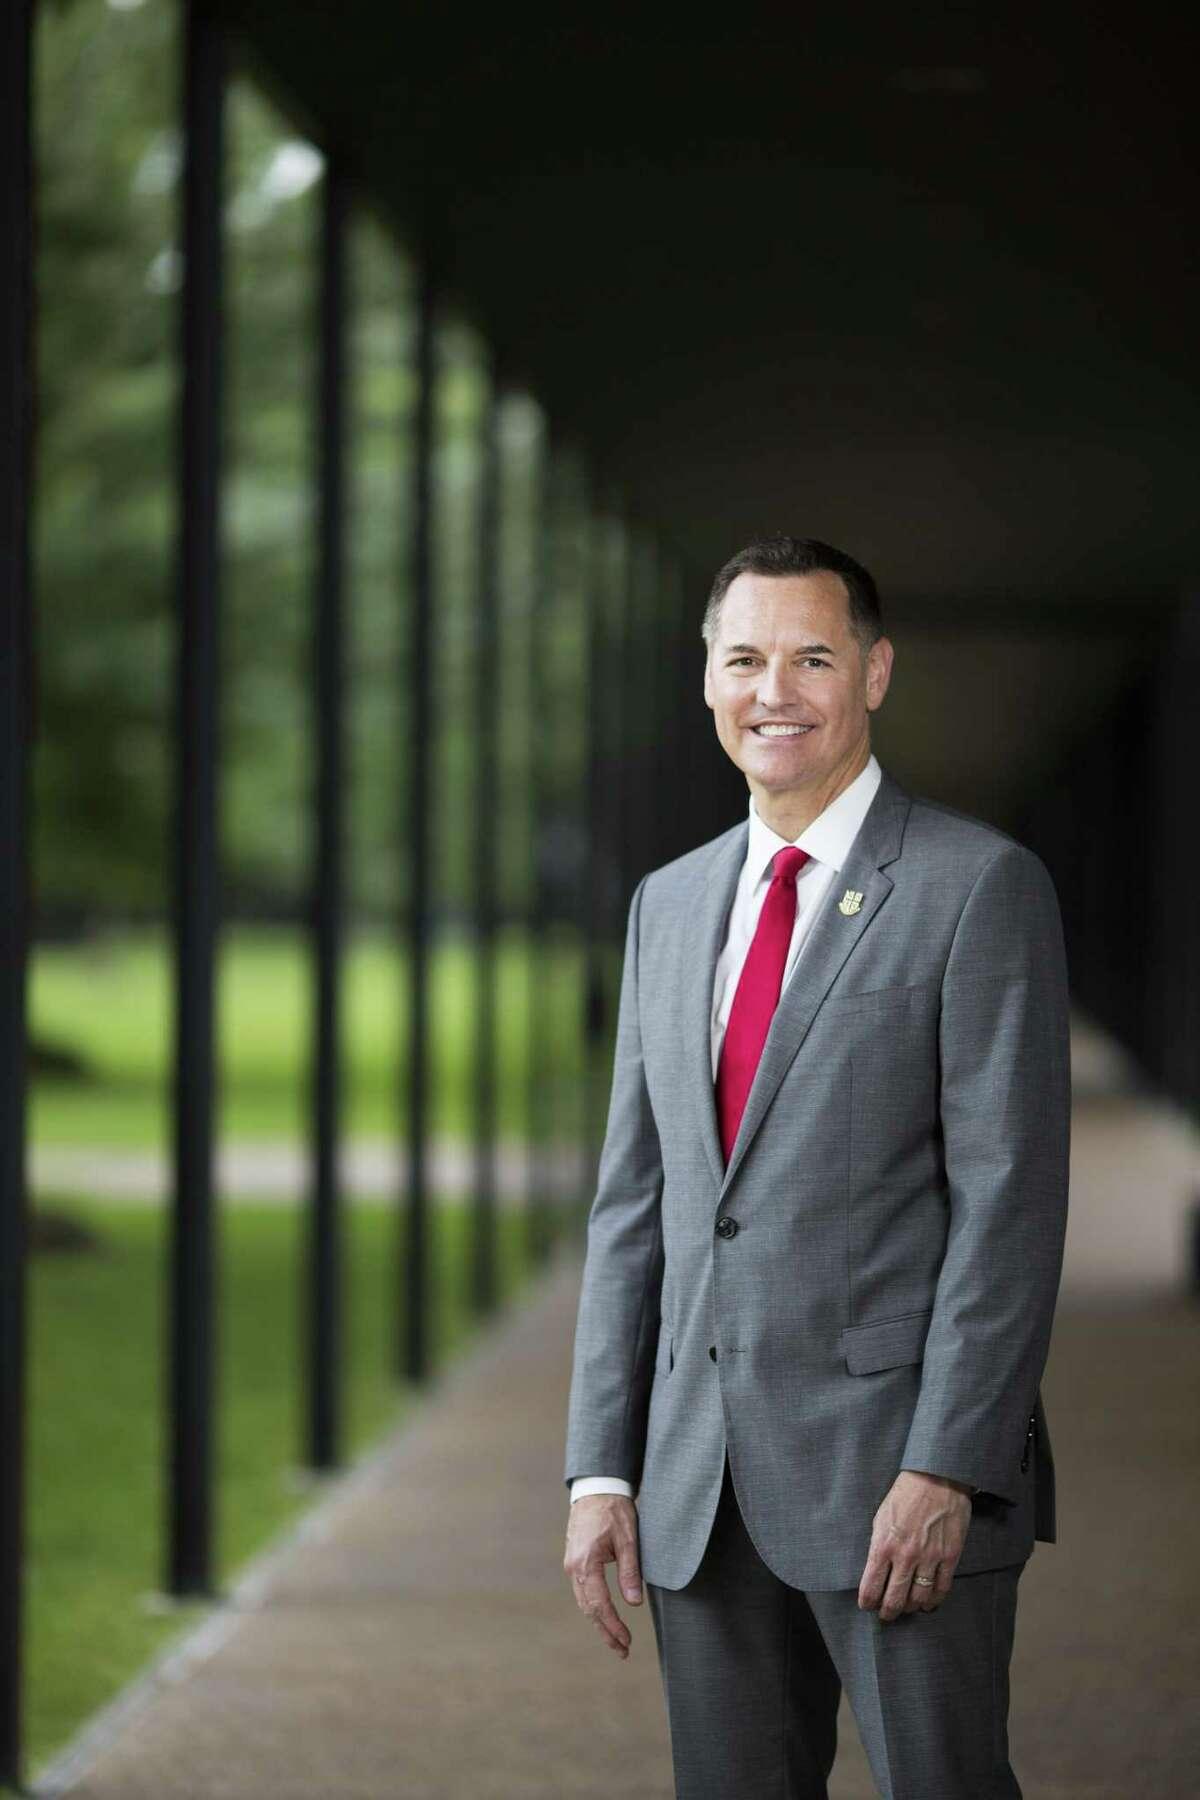 University of St. Thomas President Richard Ludwick at the University of St. Thomas Montrose campus on Wednesday, May 1, 2019, in Houston.